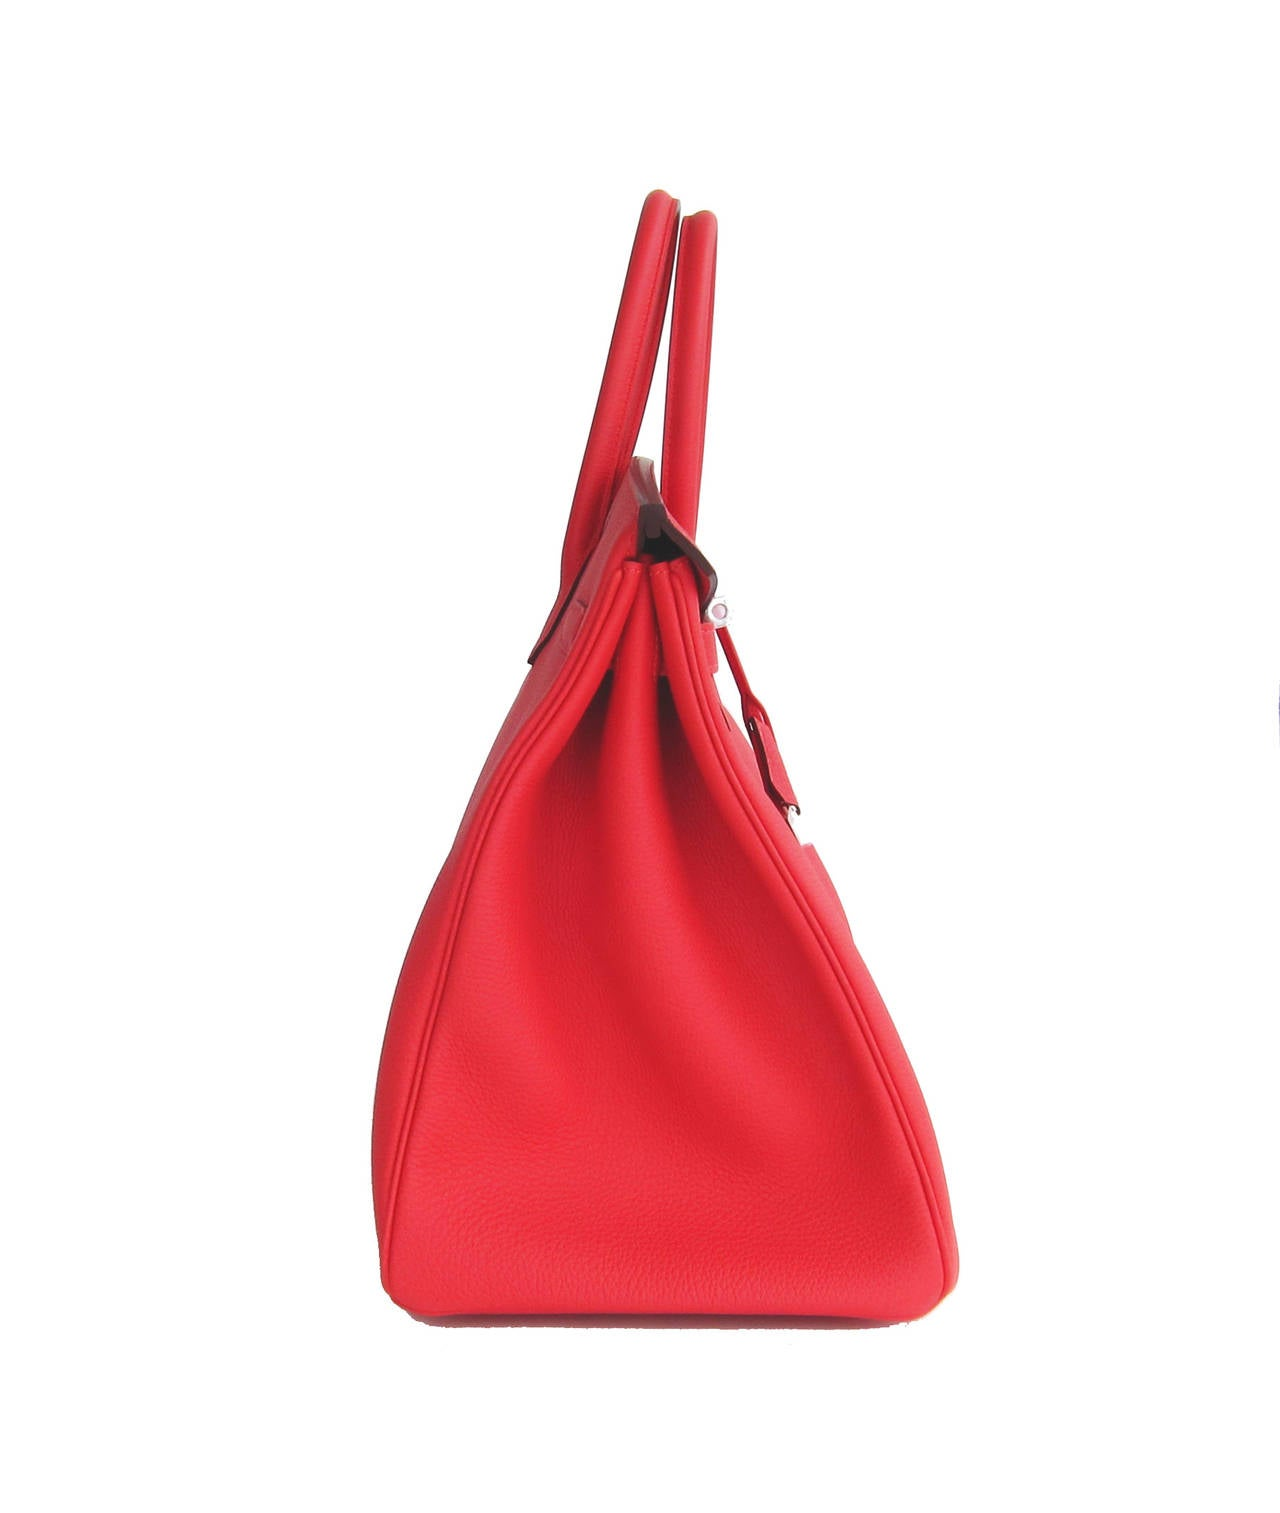 Hermes Rouge Pivoine 40cm Togo Birkin Bag Palladium Luscious For Sale 2